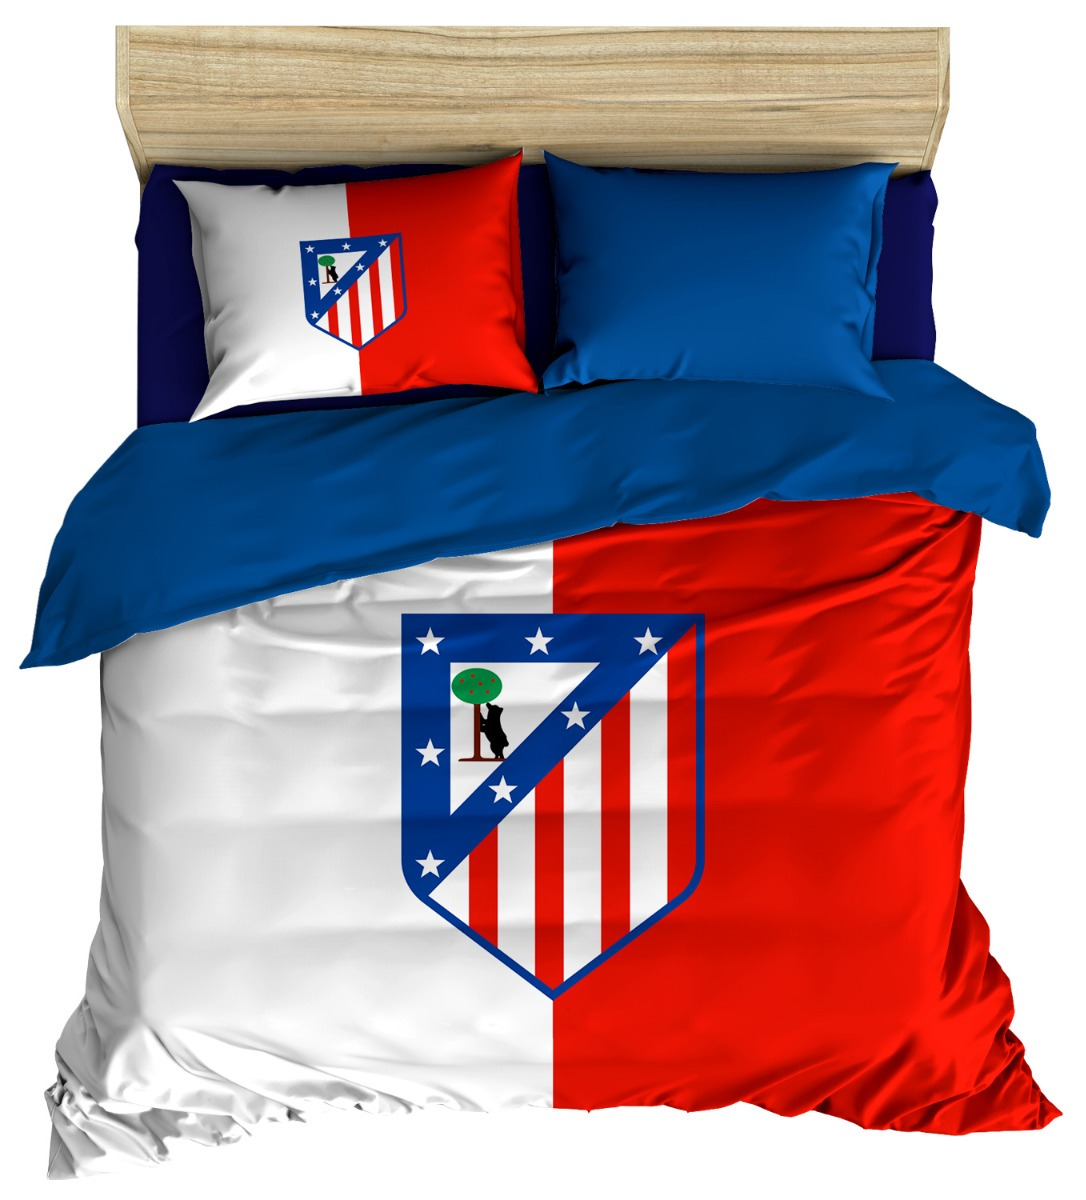 Edredon Atletico.Atletico De Madrid Edredon Matrimonial